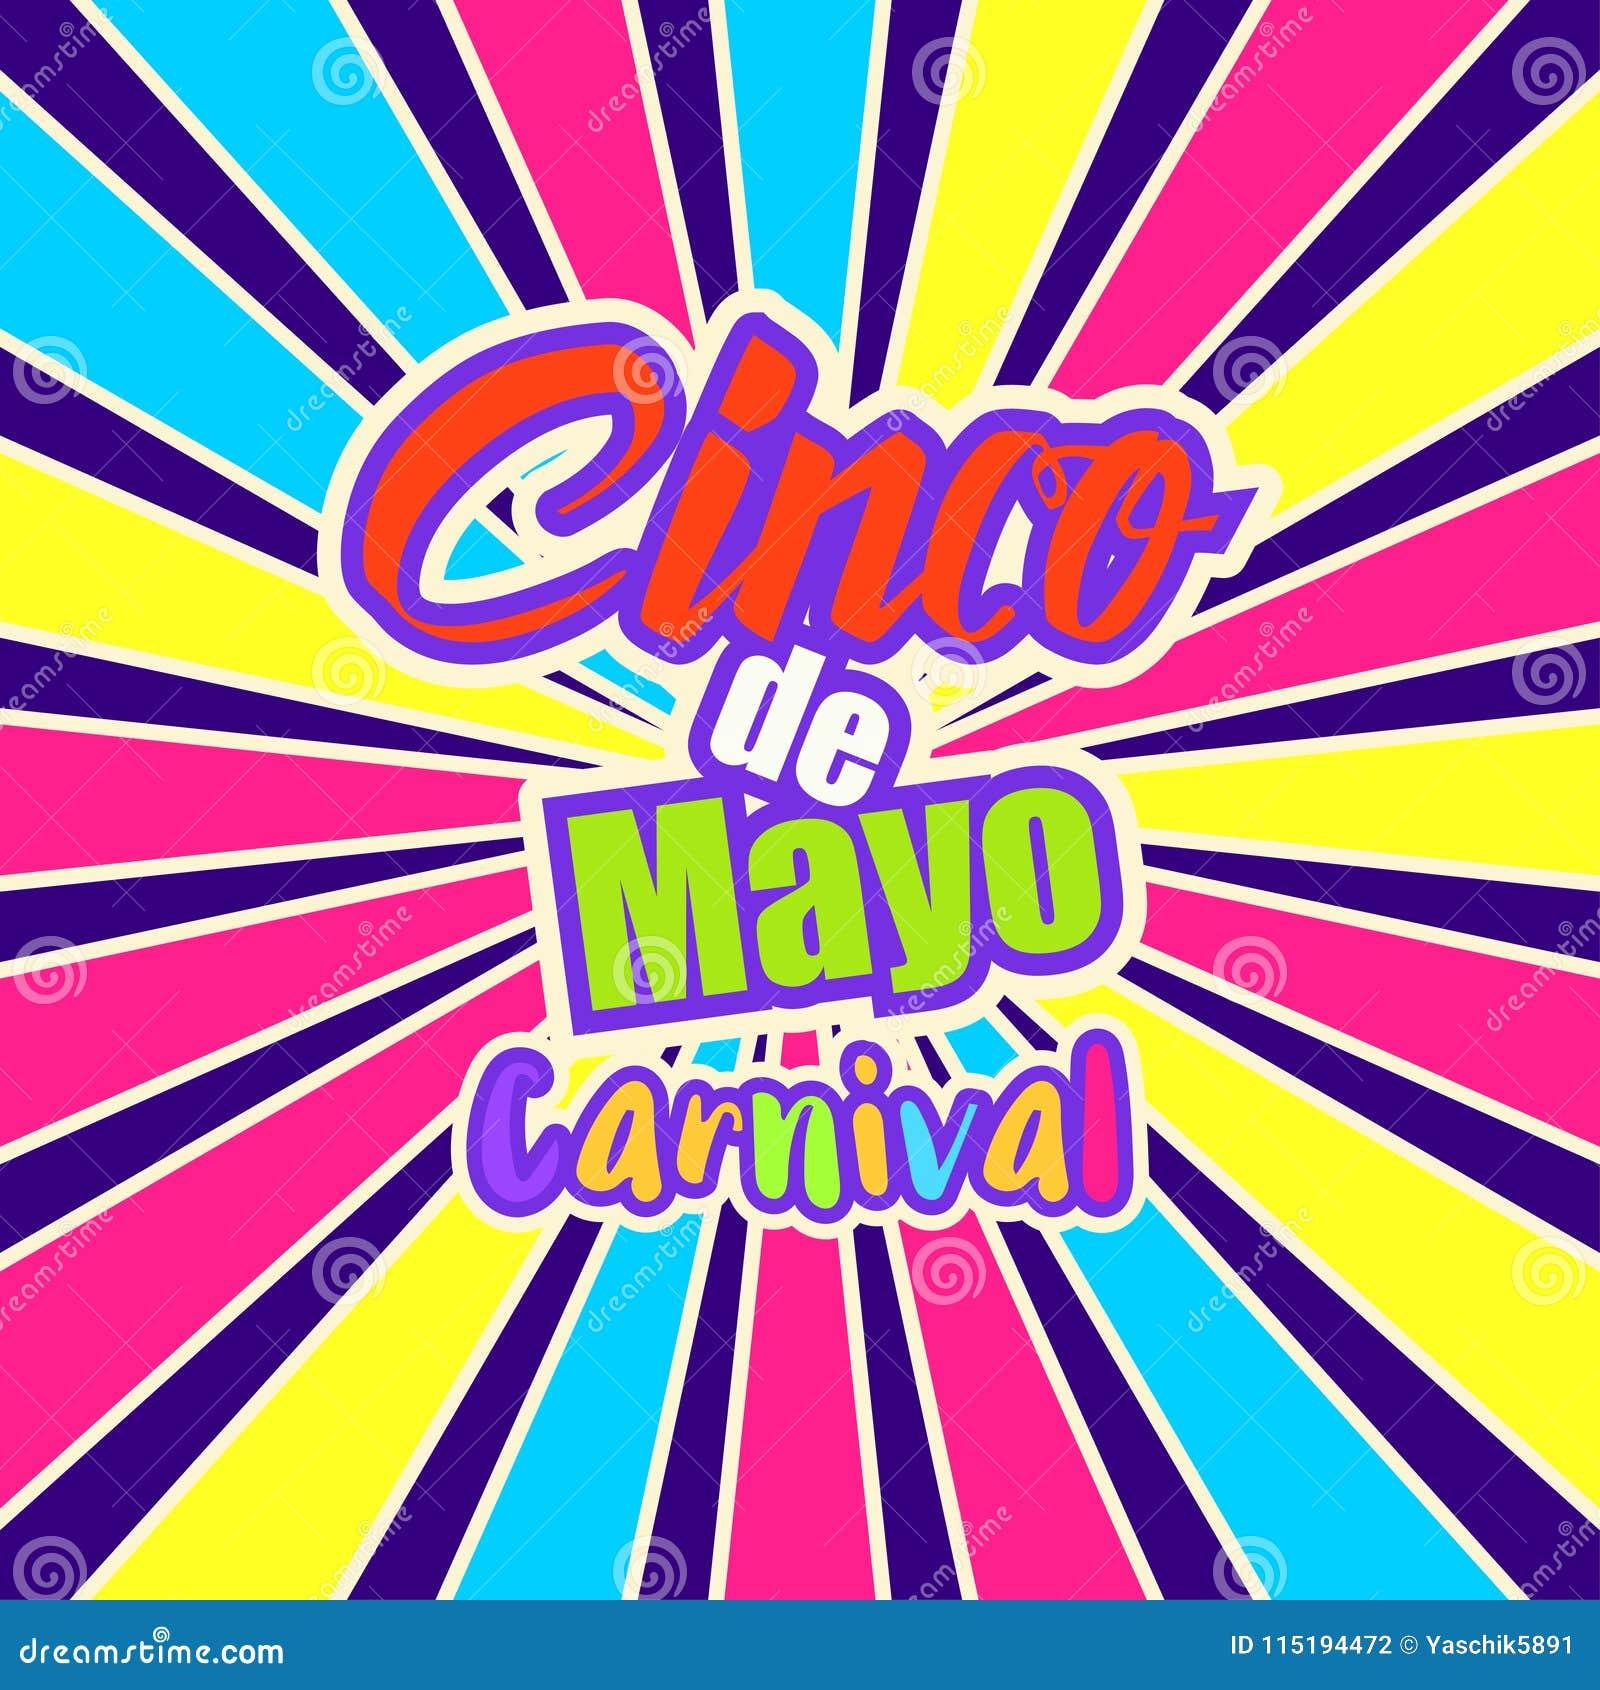 cinco de mayo celebration in mexico stock illustration illustration of mexican template 115194472